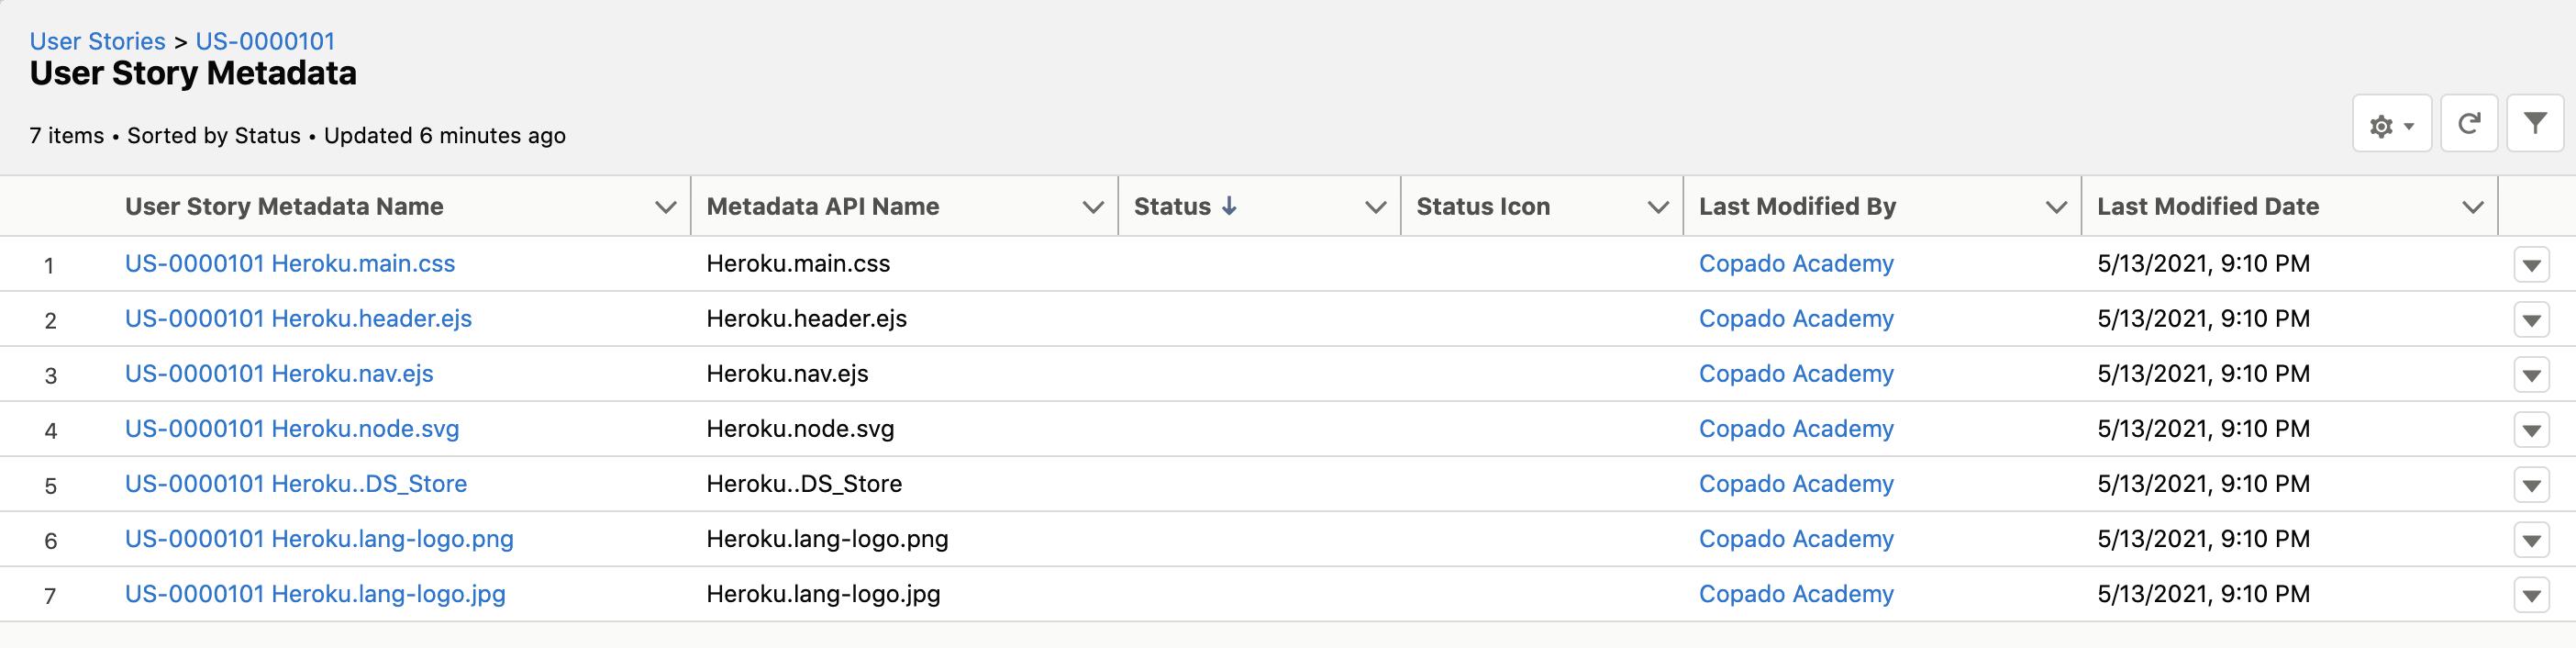 User Story Metadata records